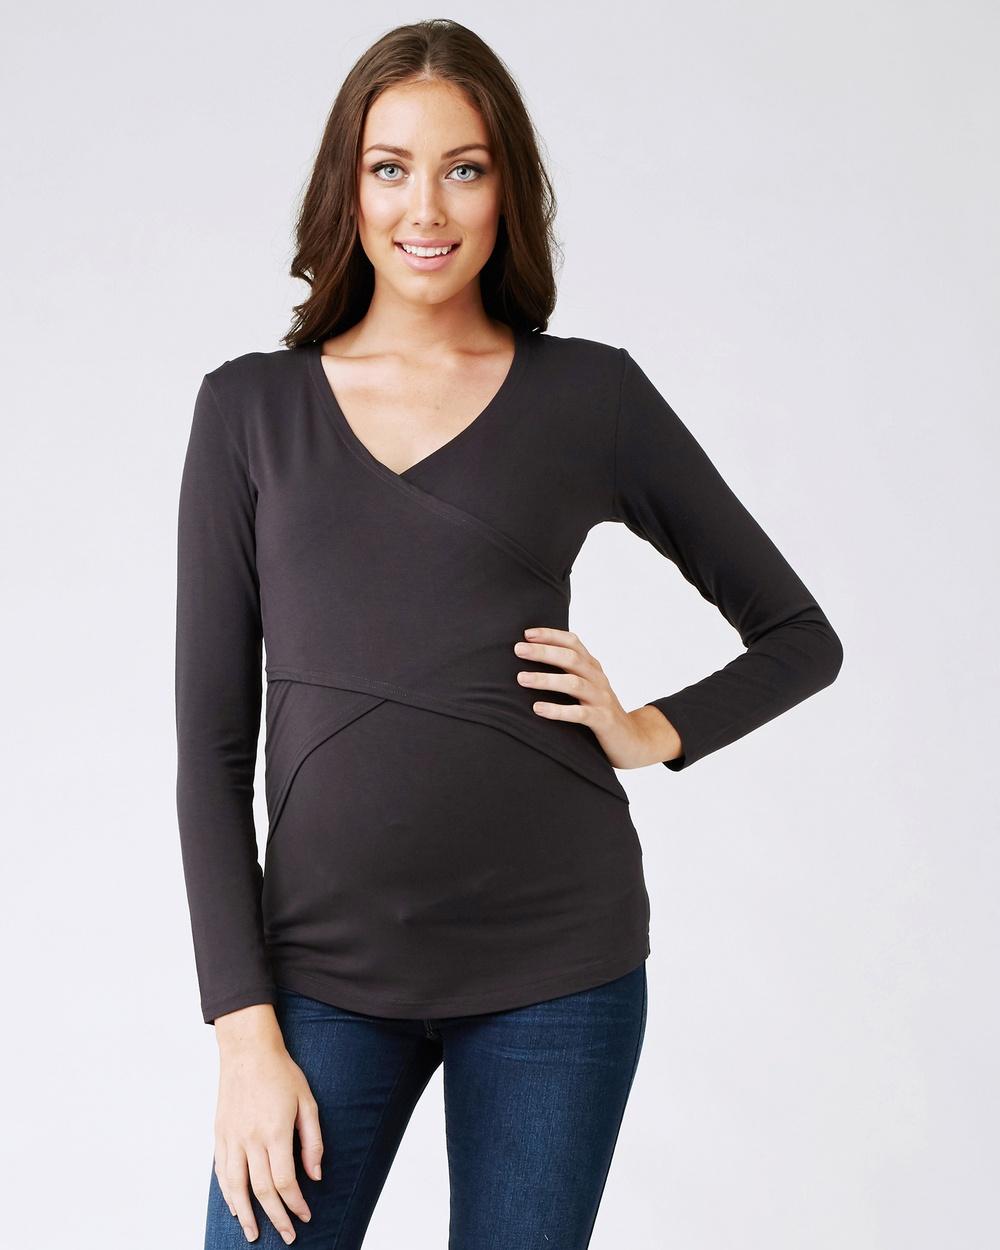 Ripe Maternity Embrace Top Tops Tar Embrace Top